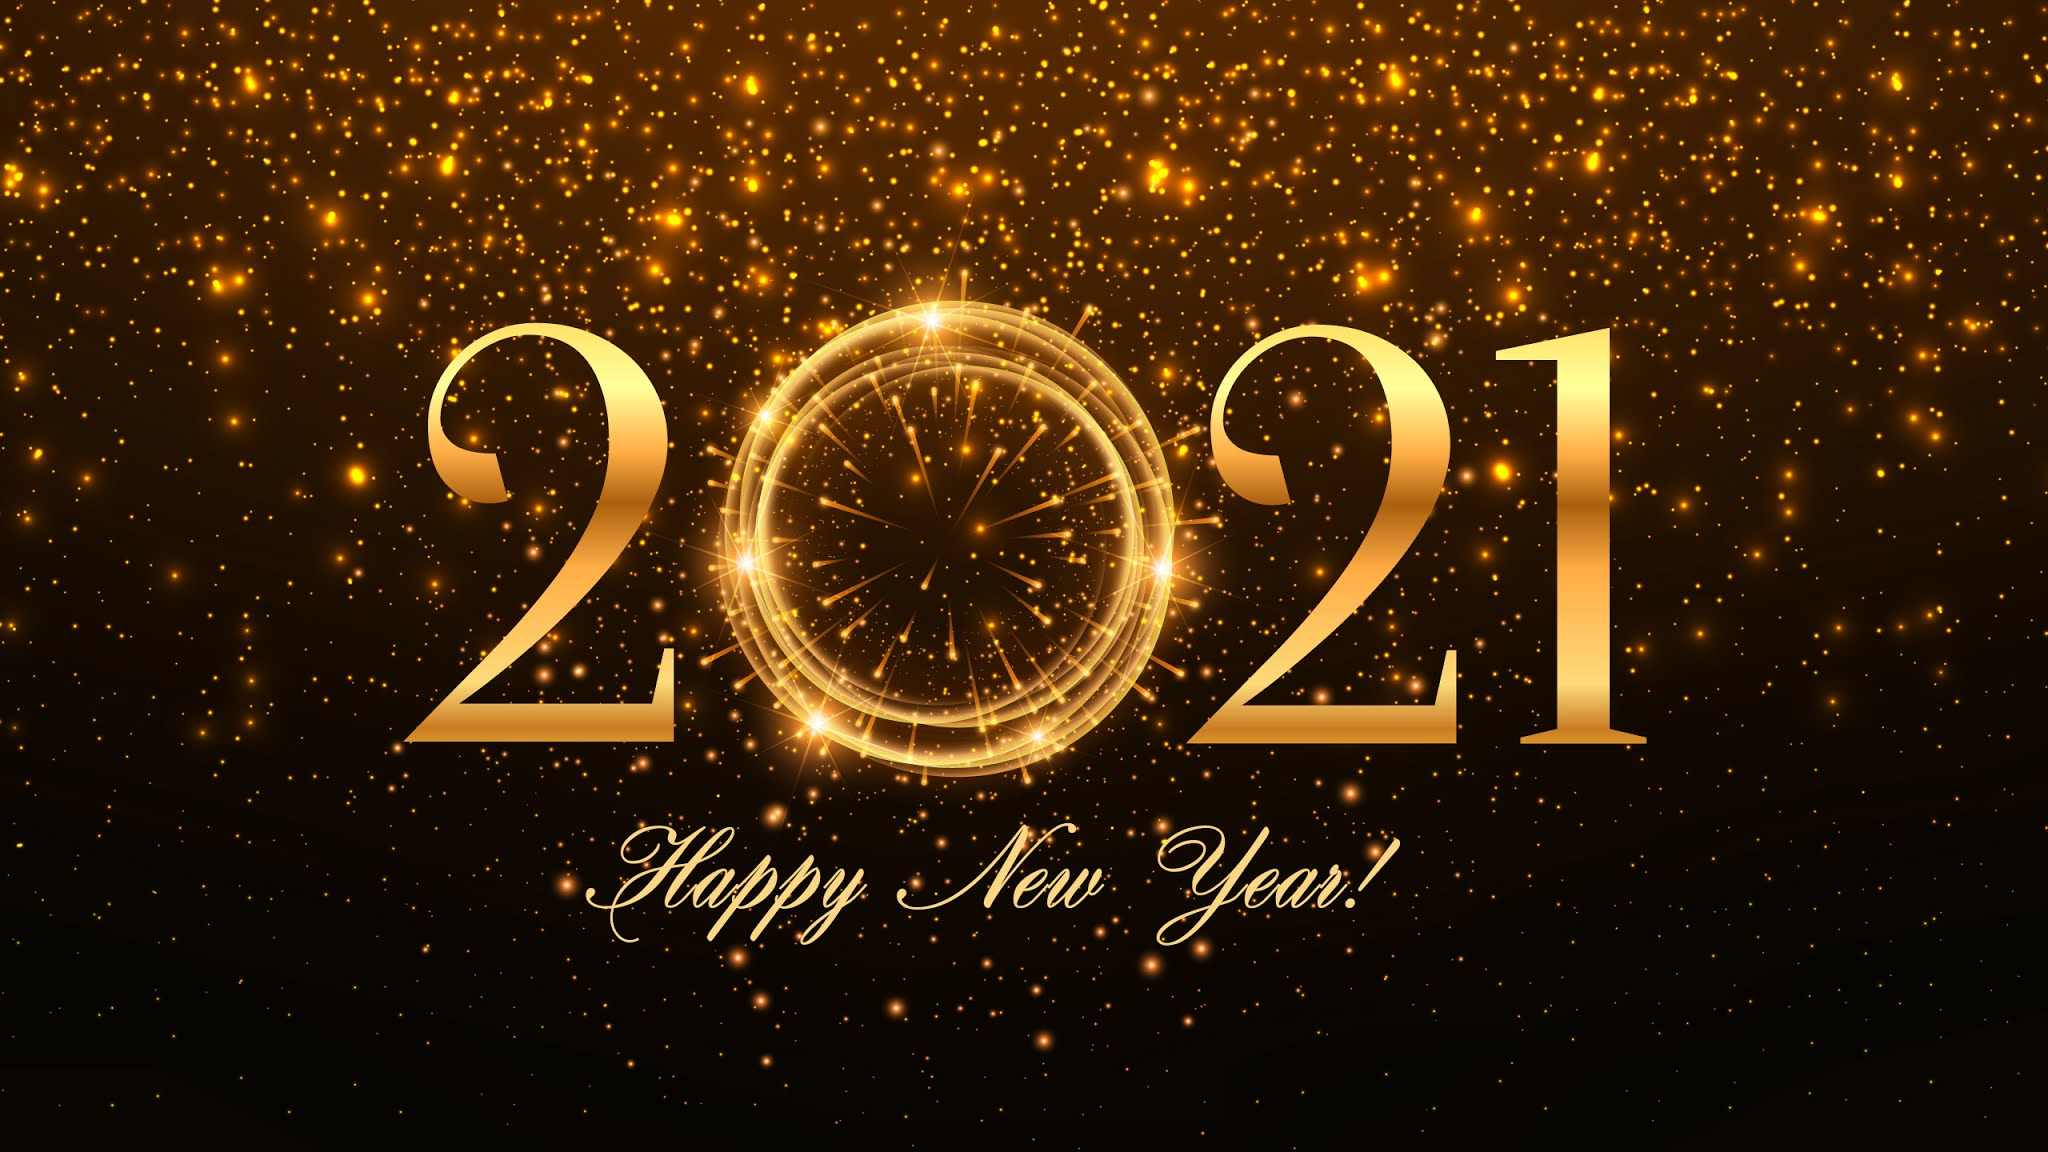 2021 Happy New Year HD Wallpaper